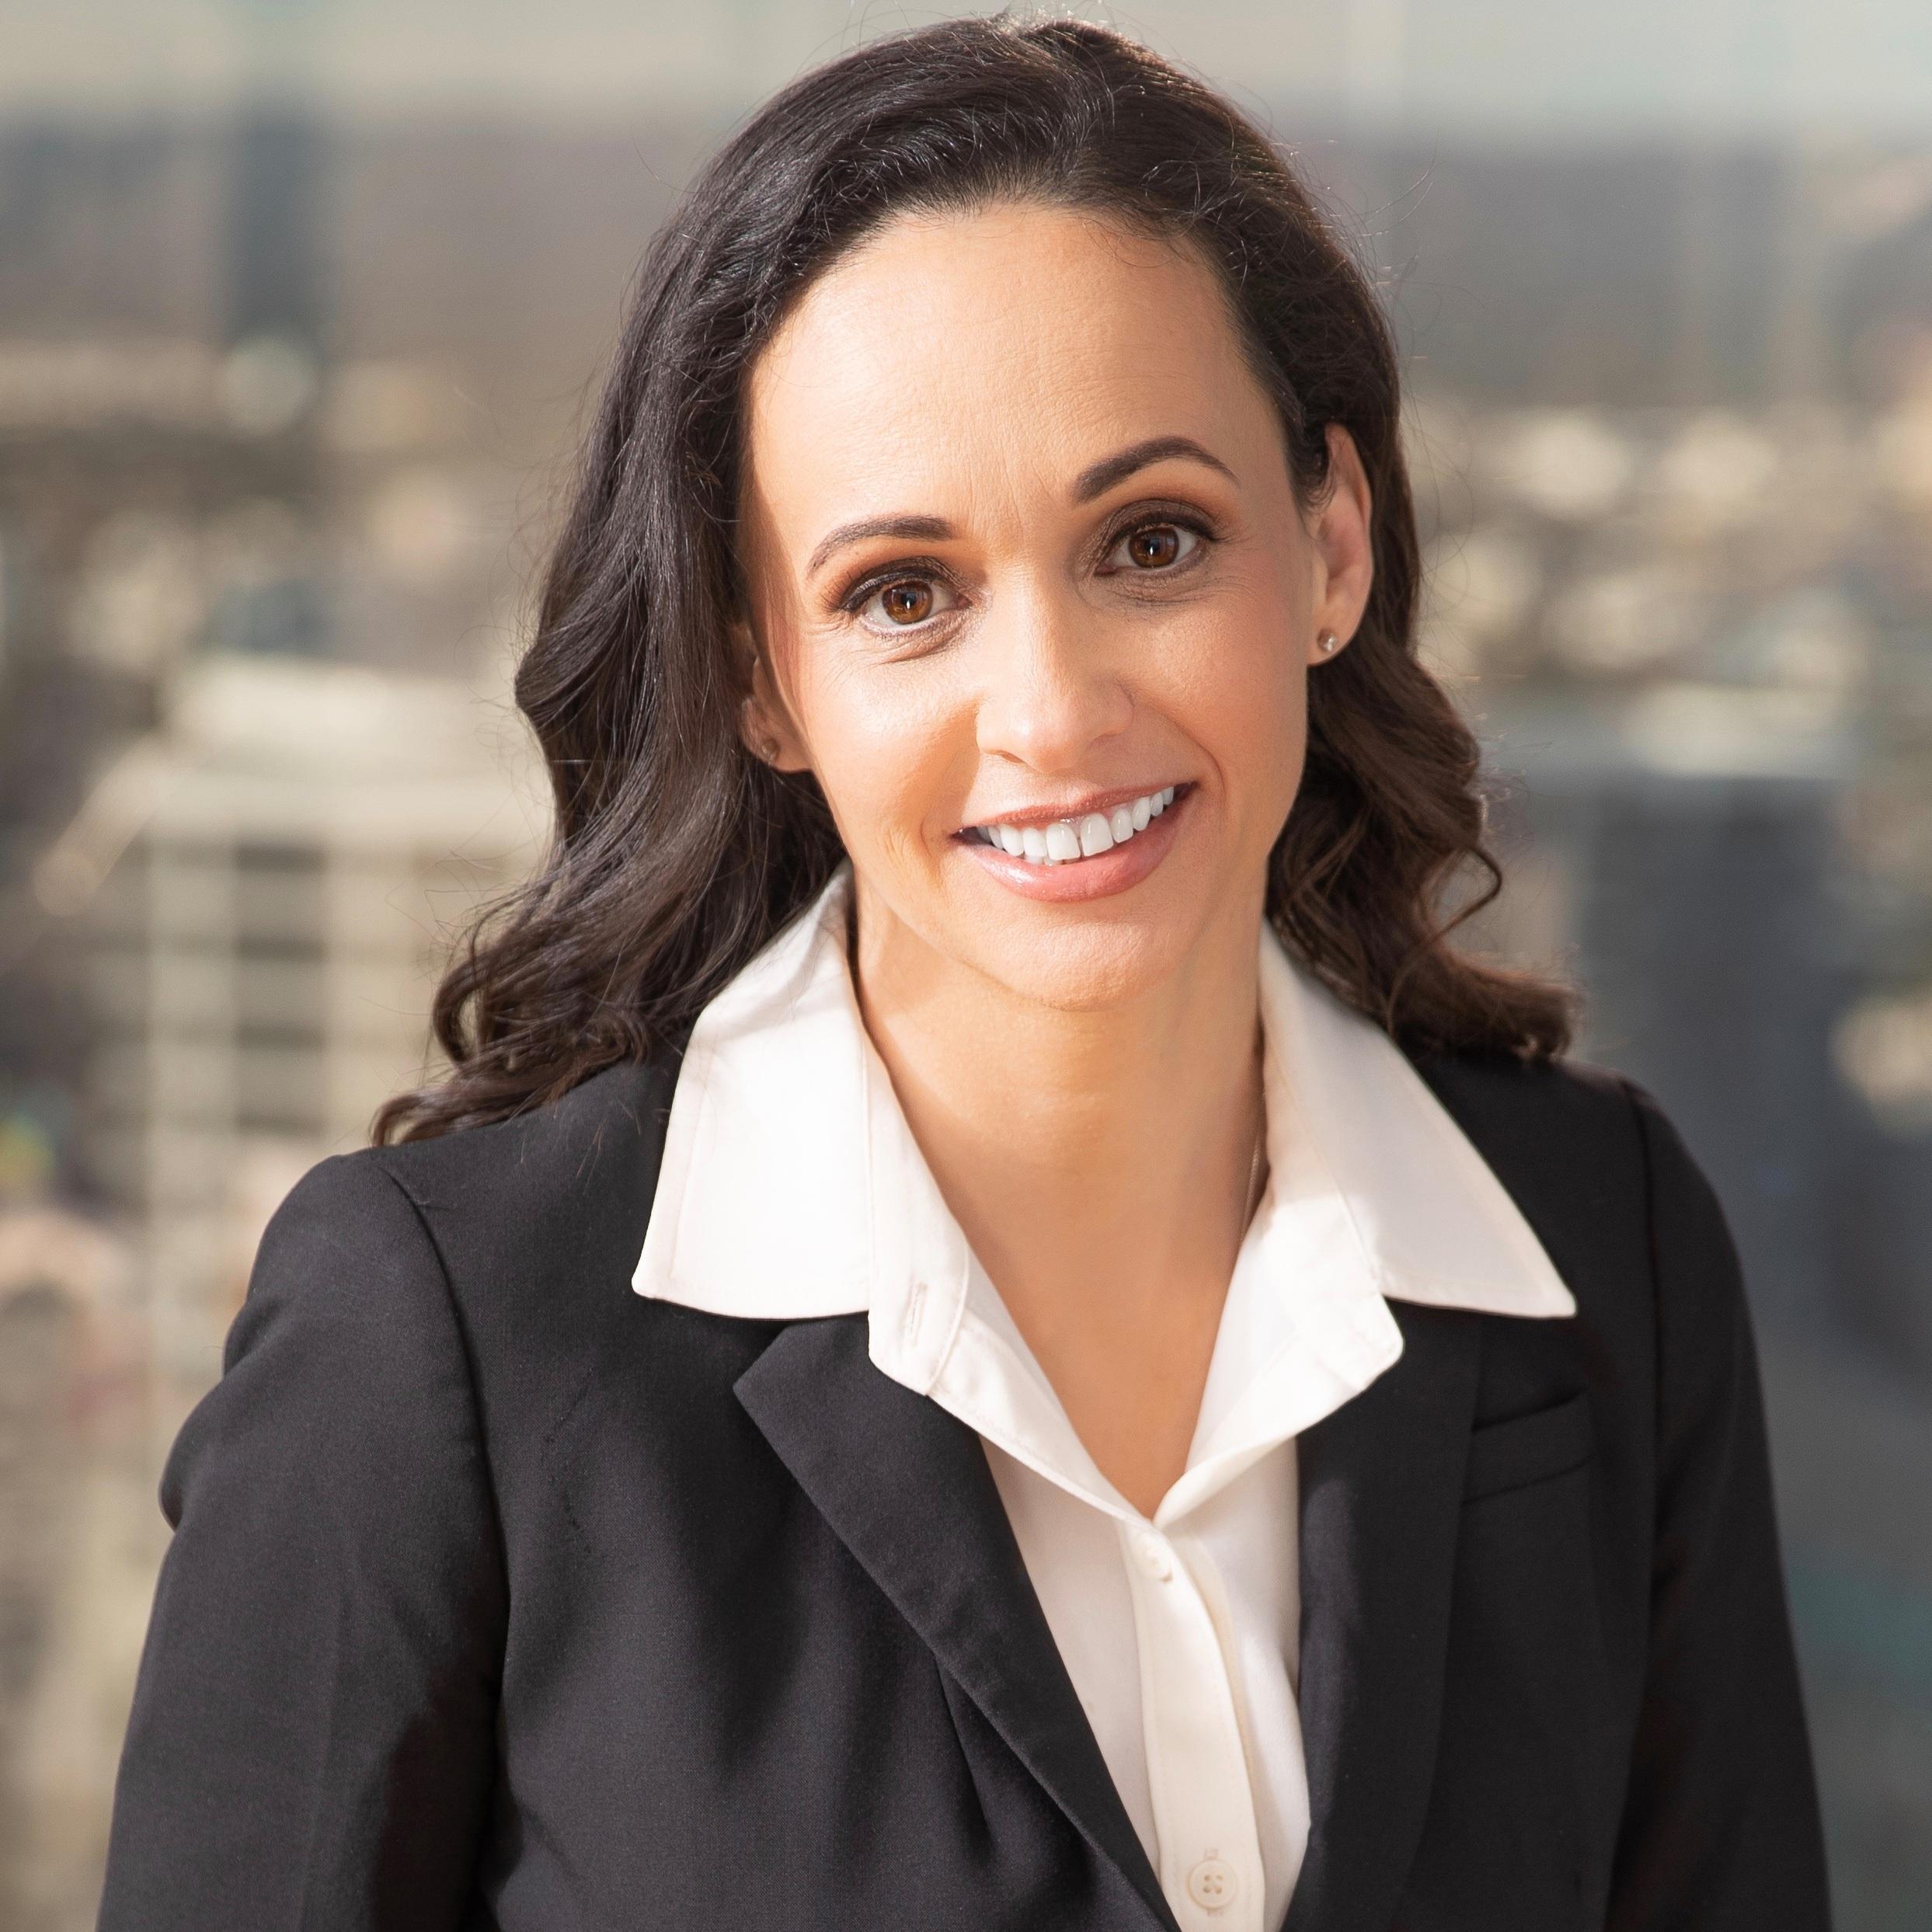 Jessica Patterson - CALIFORNIA GOP CHAIRWOMAN